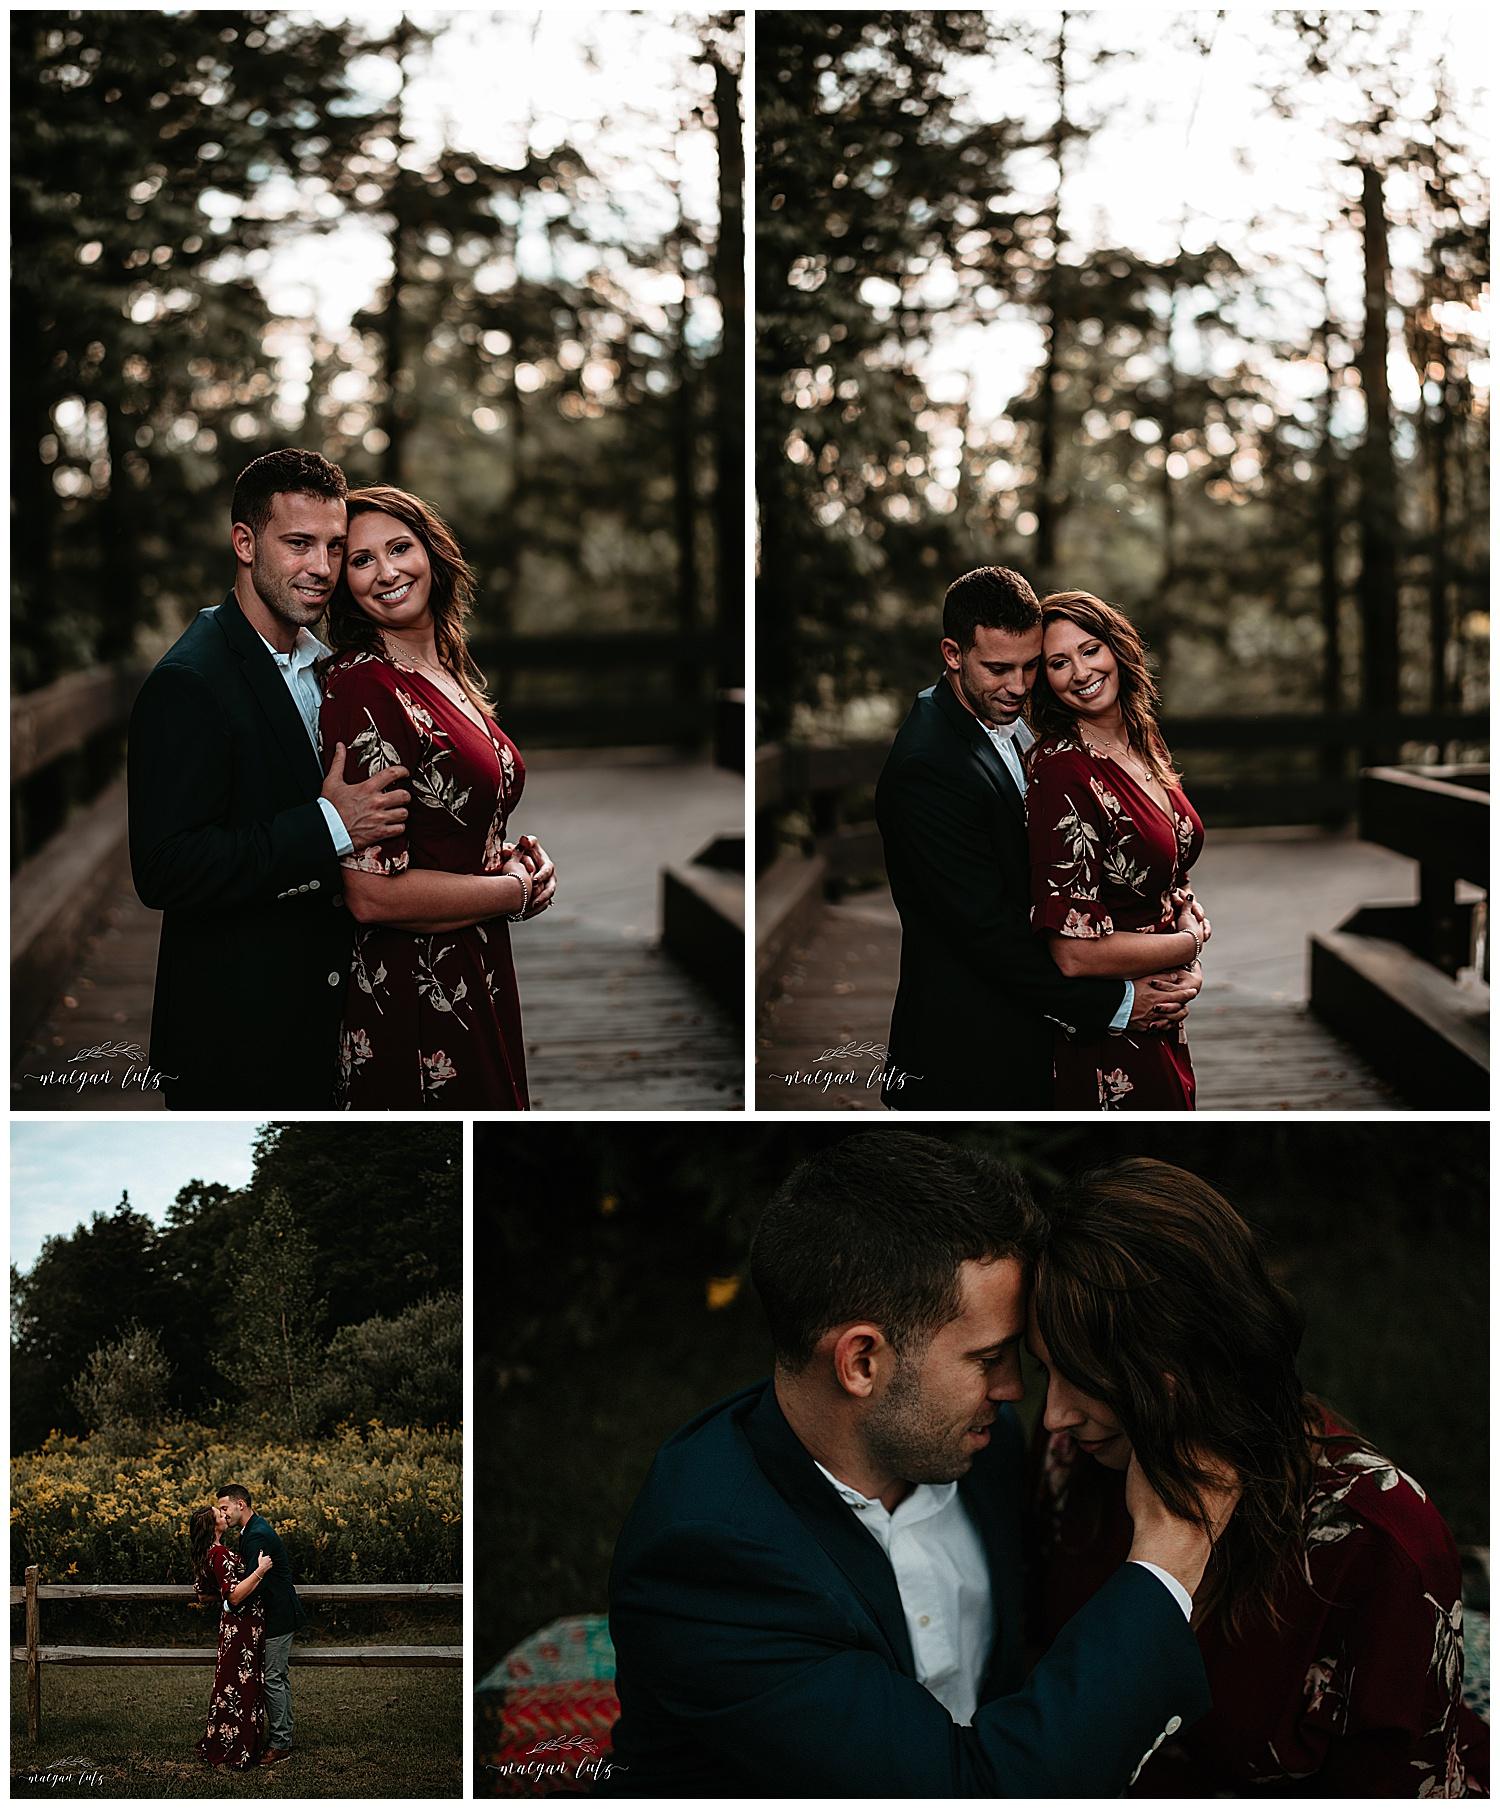 NEPA-Bloomgsburg-Wedding-Photographer-in-the-Lehigh-Valley_0024.jpg